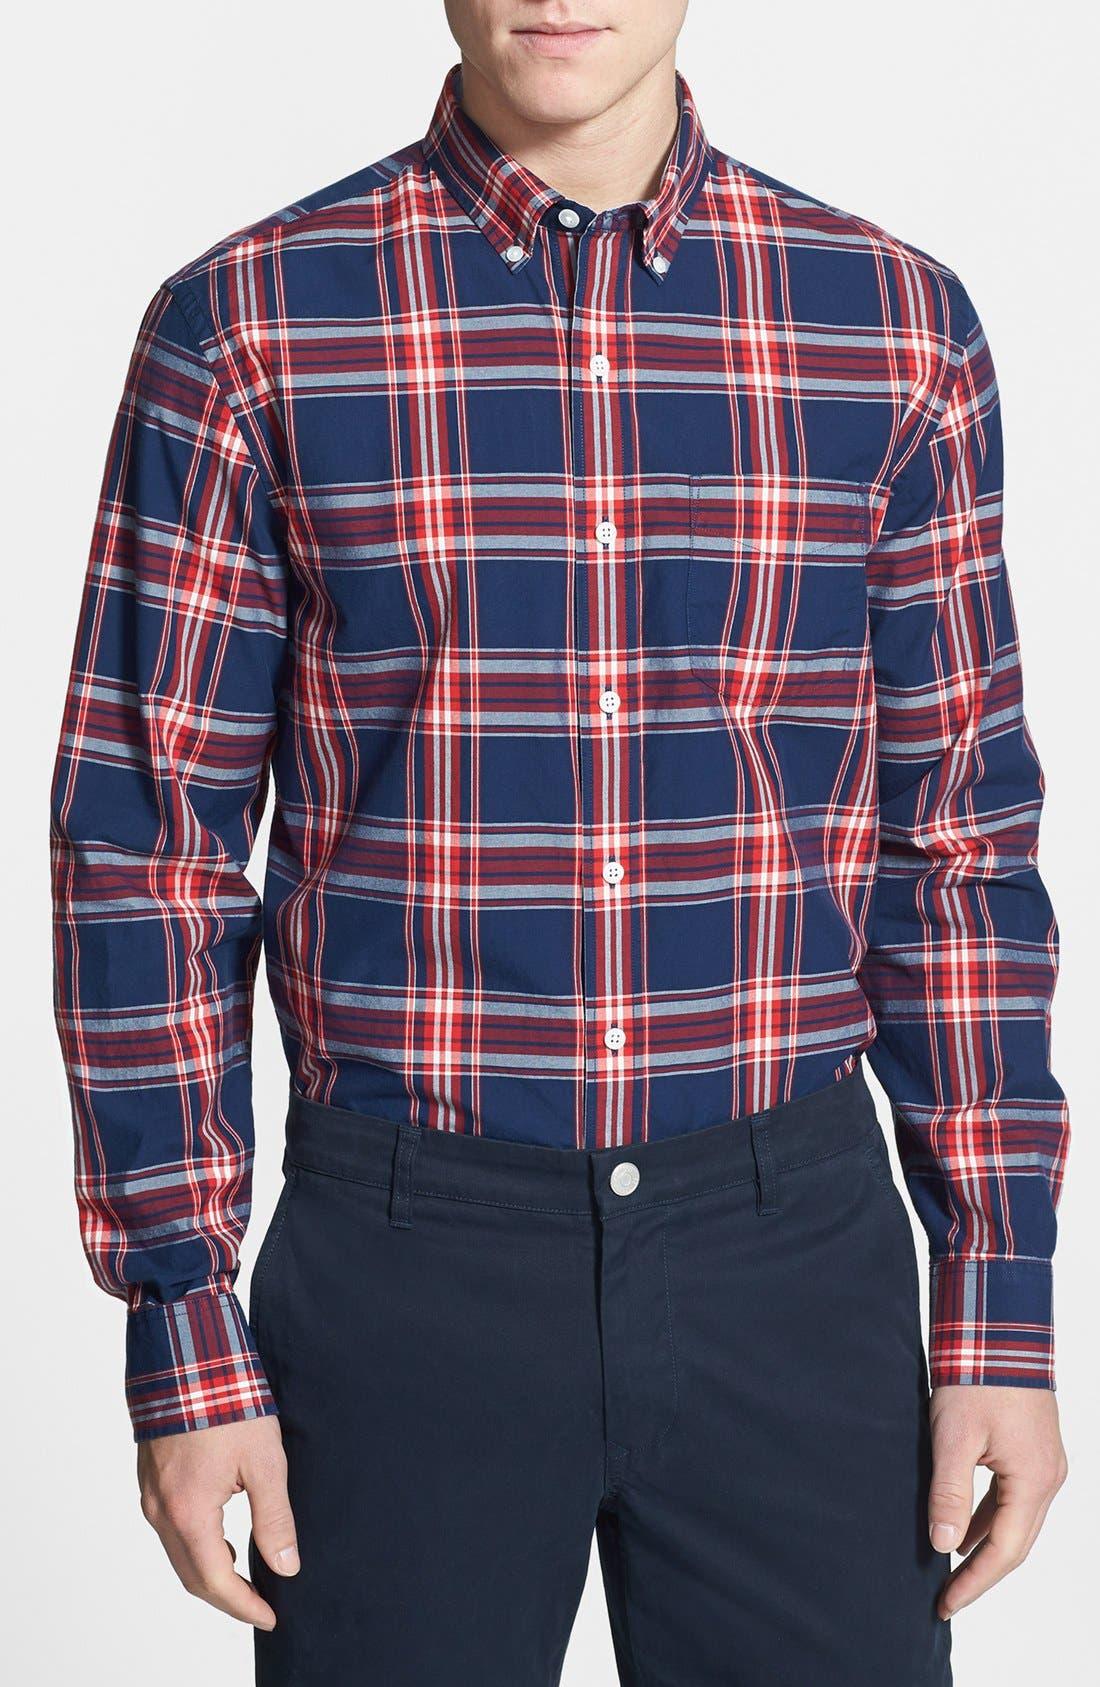 Main Image - Bonobos 'Dalton' Standard Fit Plaid Shirt